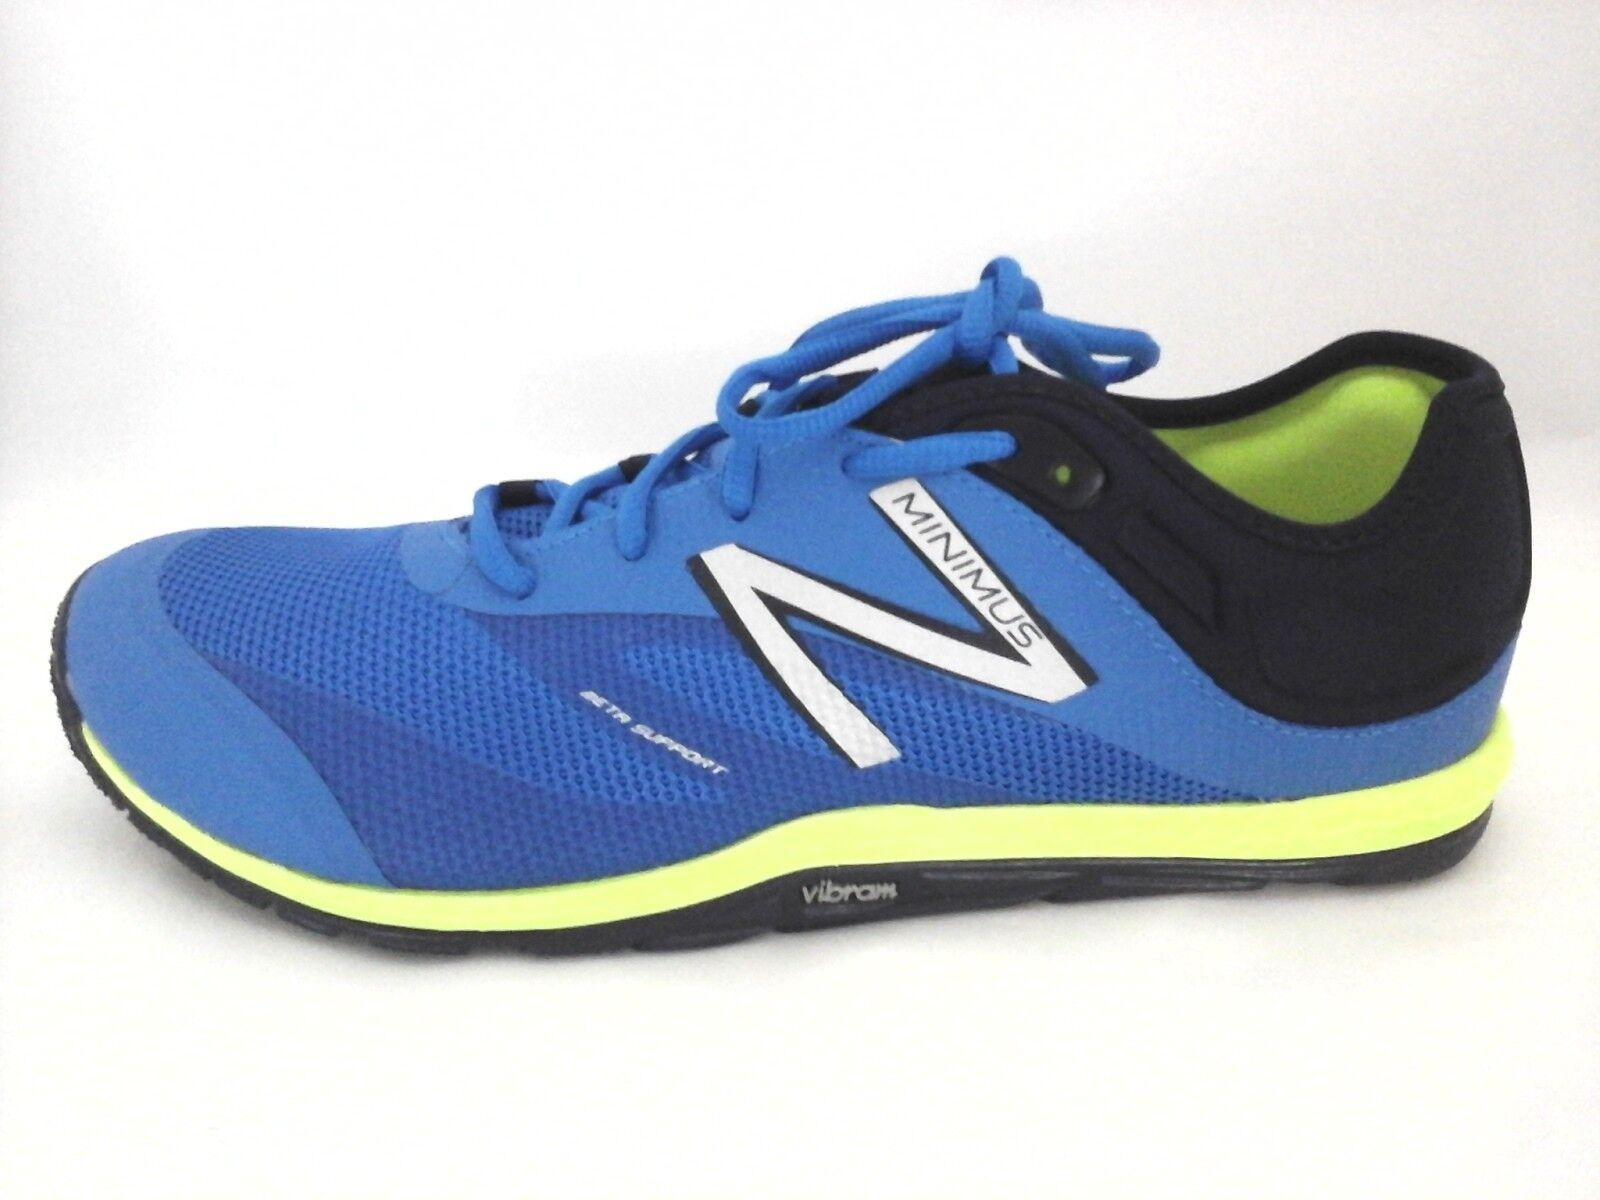 NEW BALANCE Minimus Sneakers blueE Cross Training shoes MX20BG6 Men's  120 New